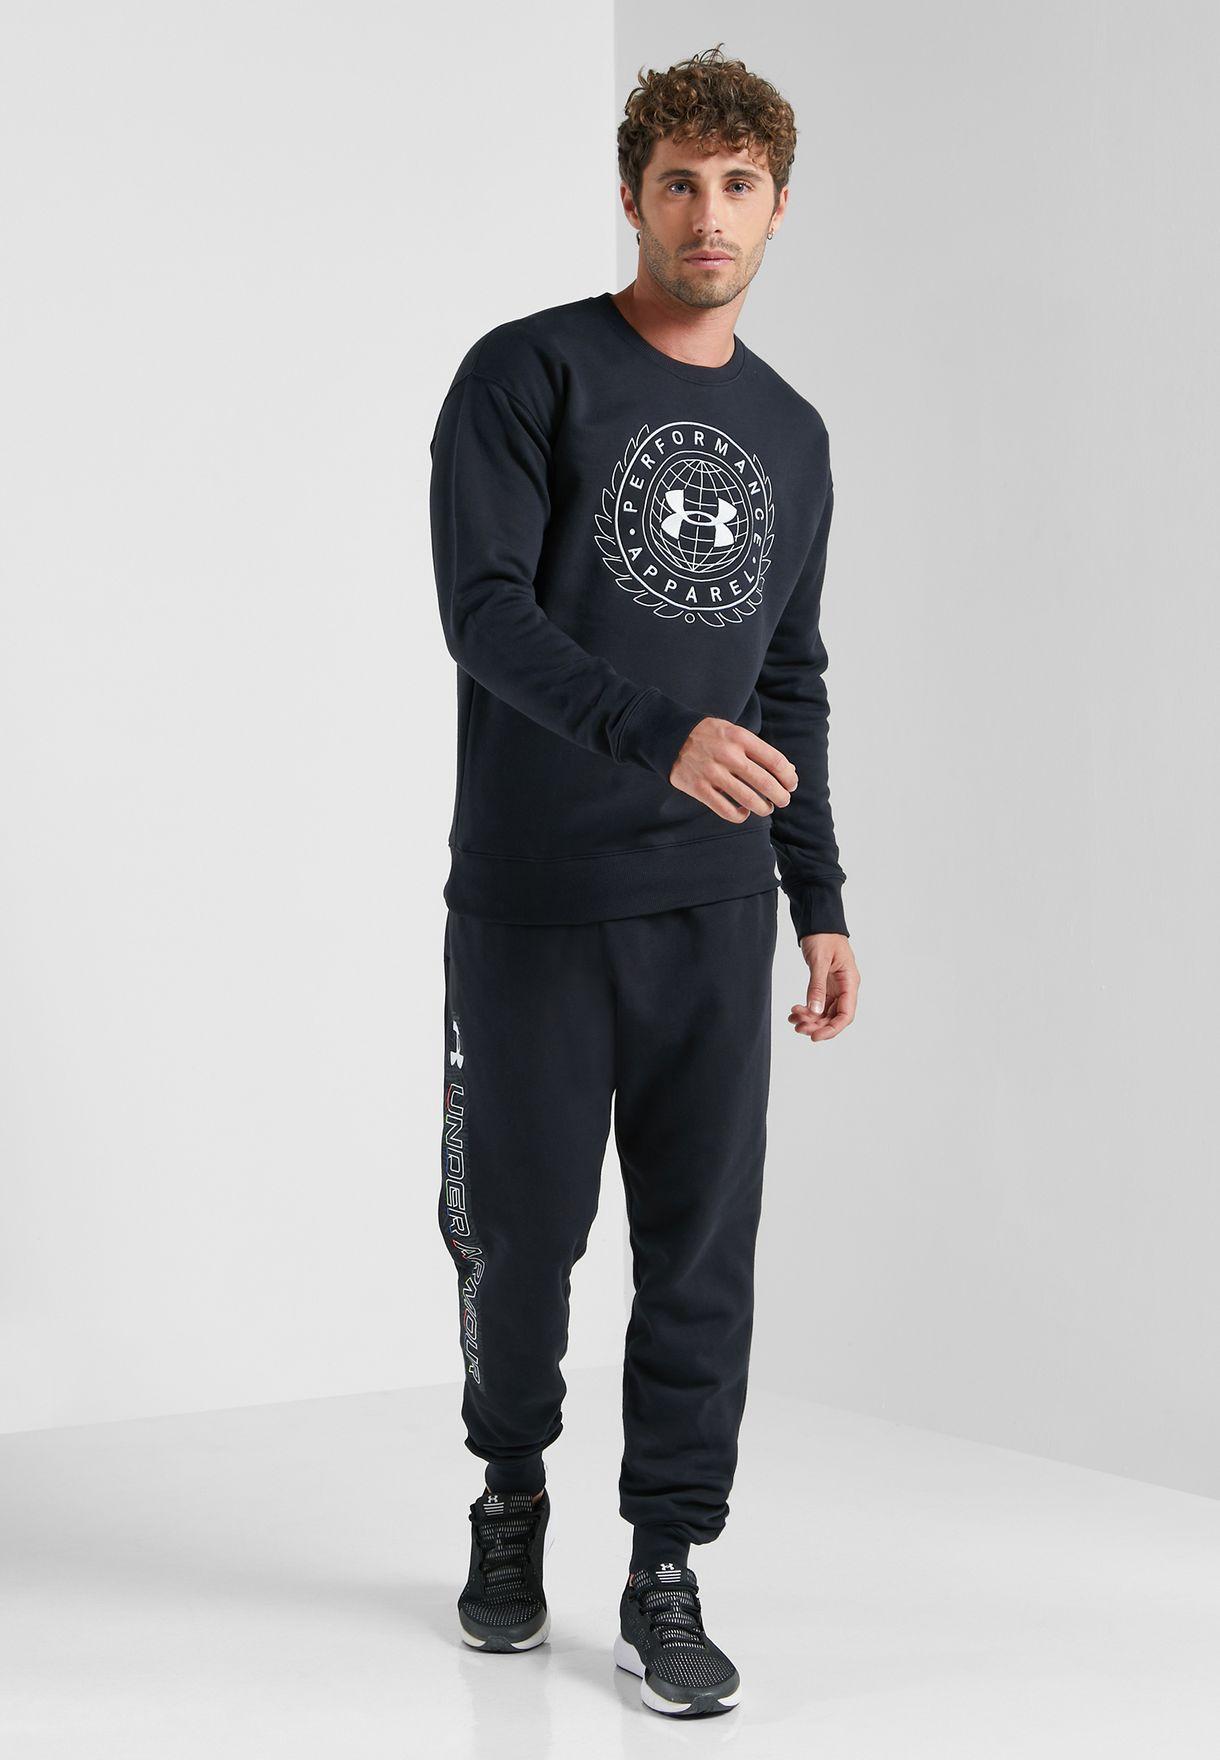 Rival Fleece Alma Mater Sweatshirt